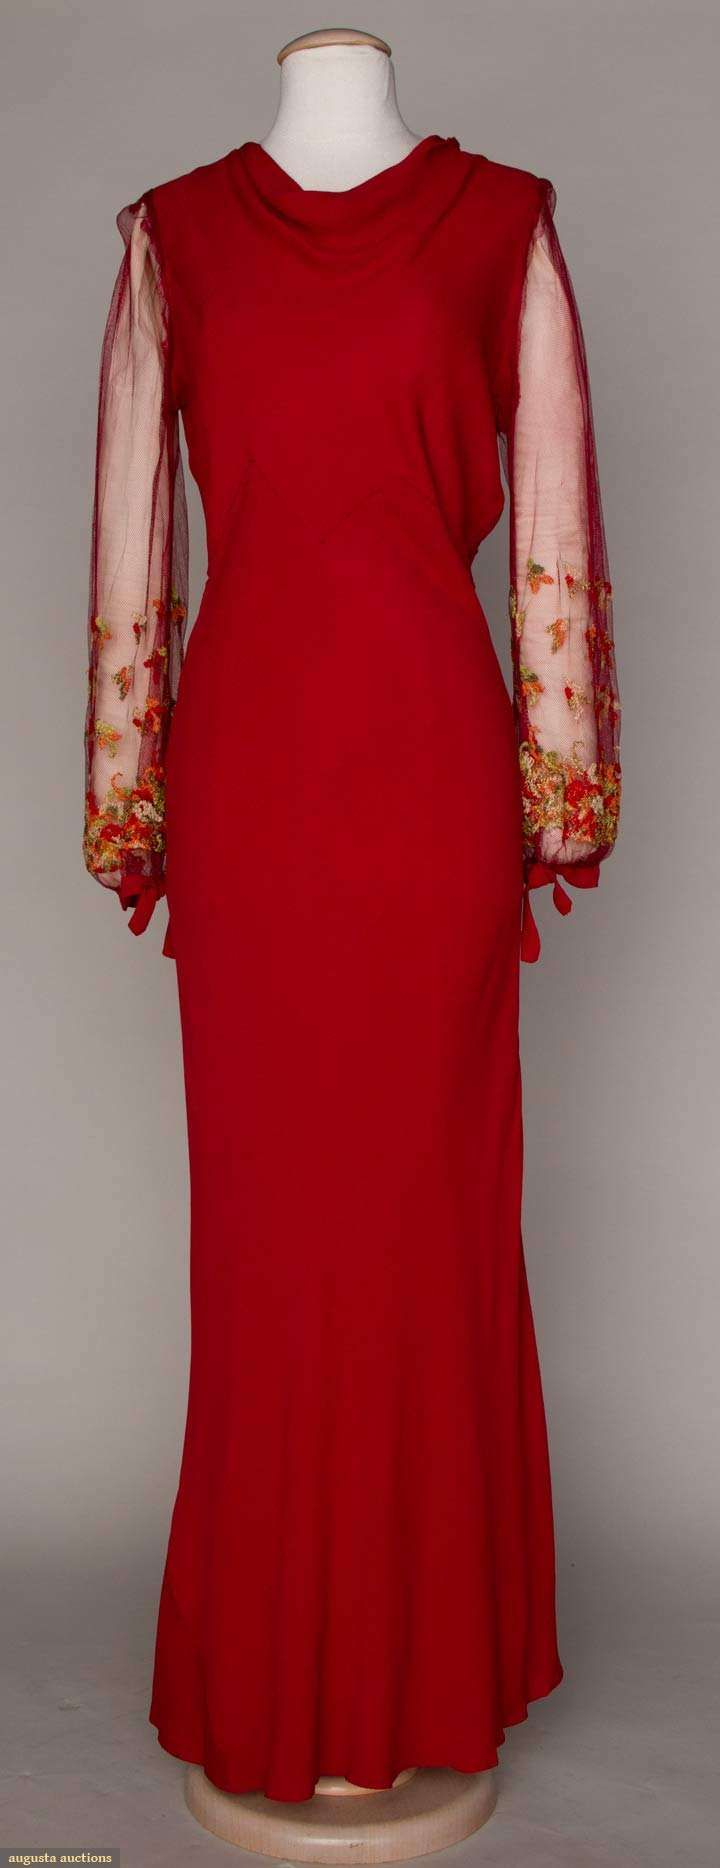 Vintage s set kyoto blossom ensemble fashion glam of the